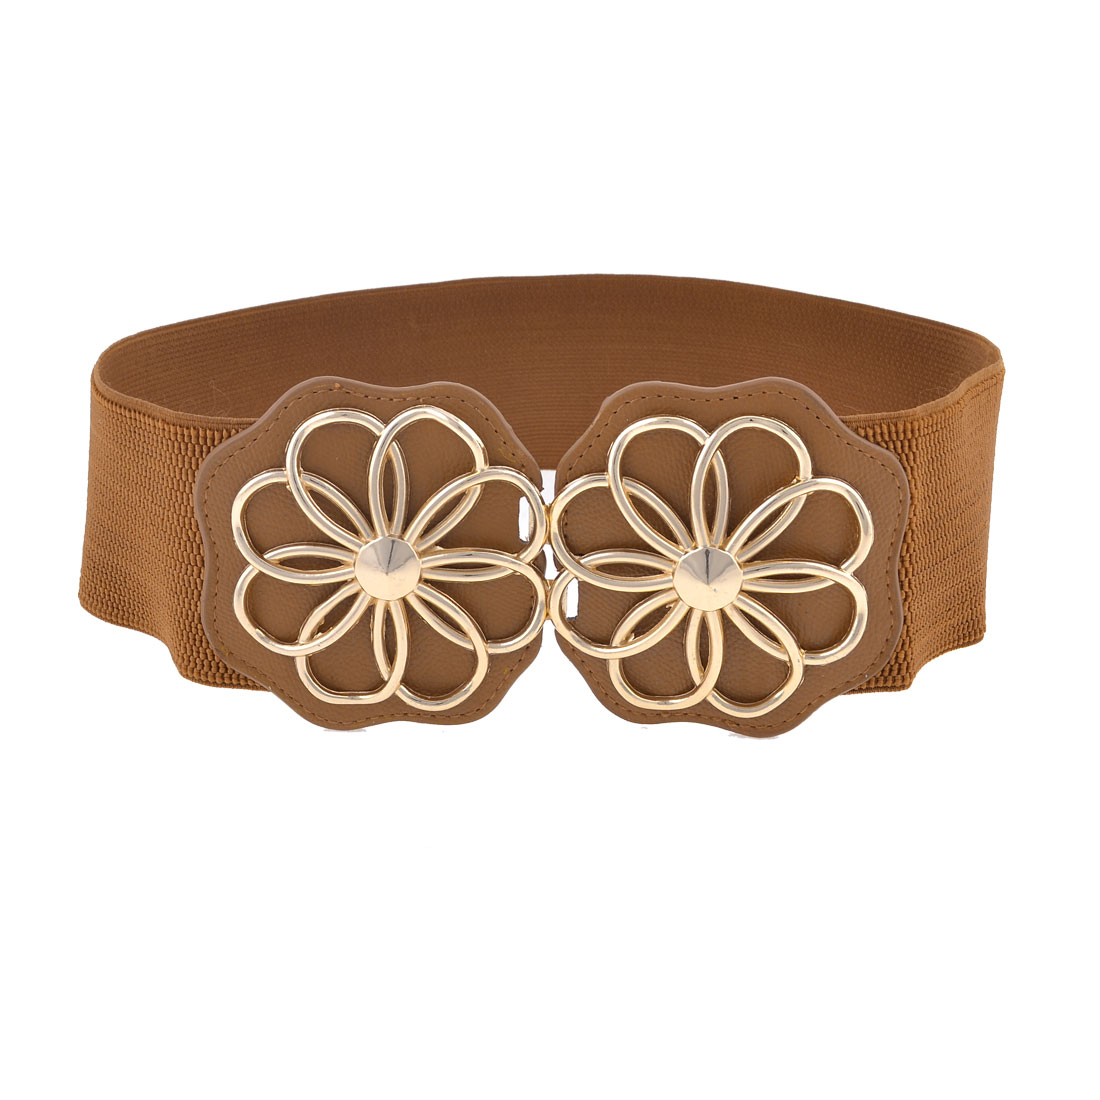 Woman Dual Flowers Interlock Buckle Brown Faux Leather Stretchy Waist Belt 7.5CM Wide